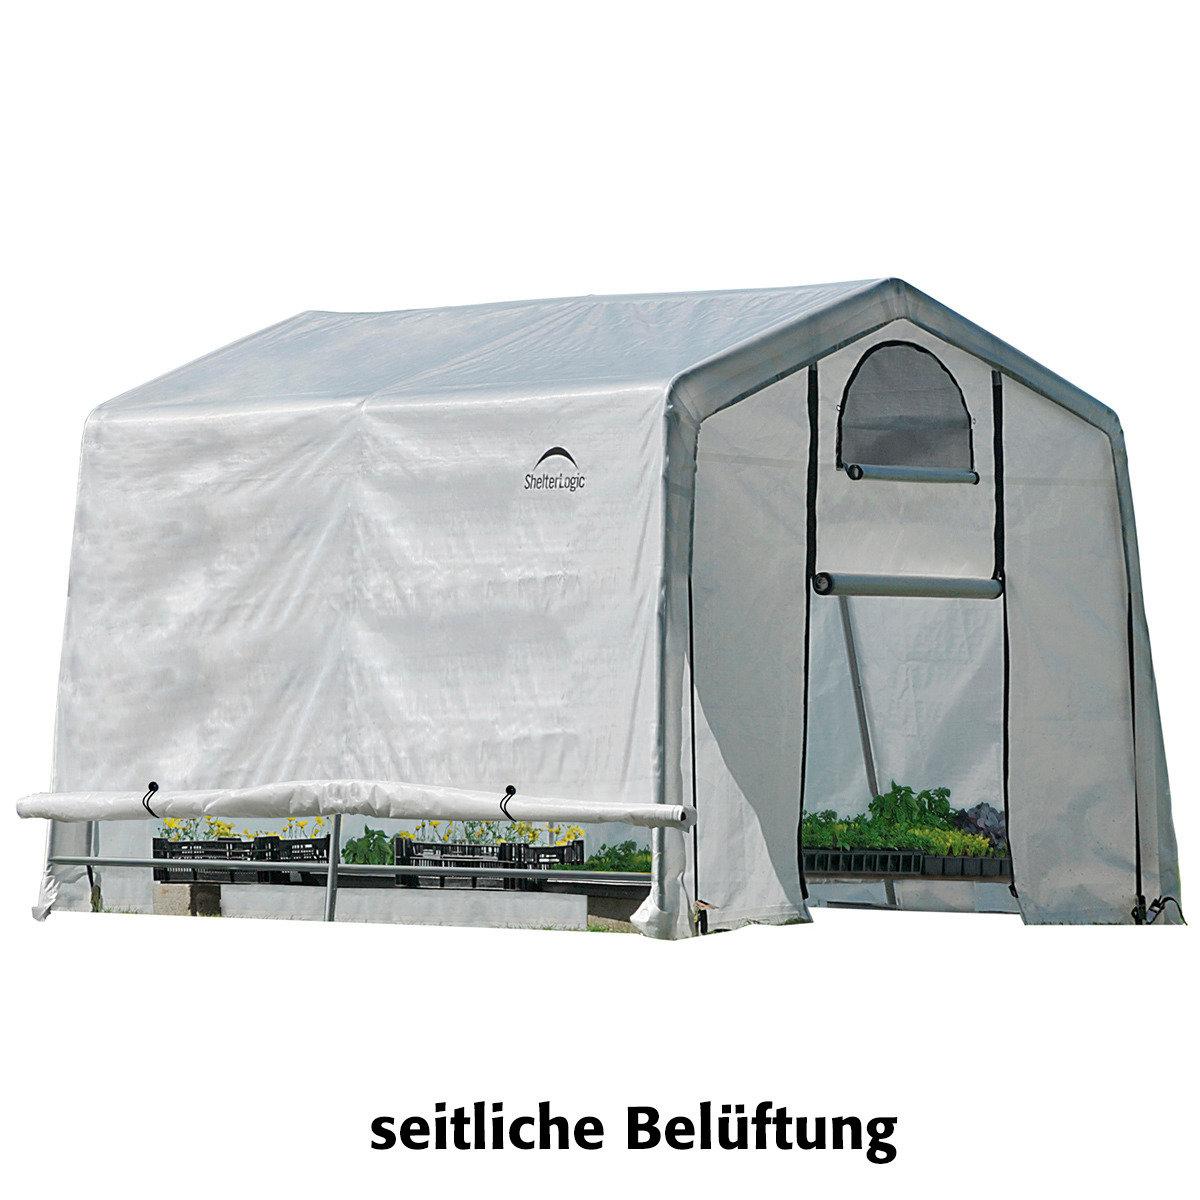 ShelterLogic Folien-Gewächshaus 9m² inkl. Sturmanker | #6